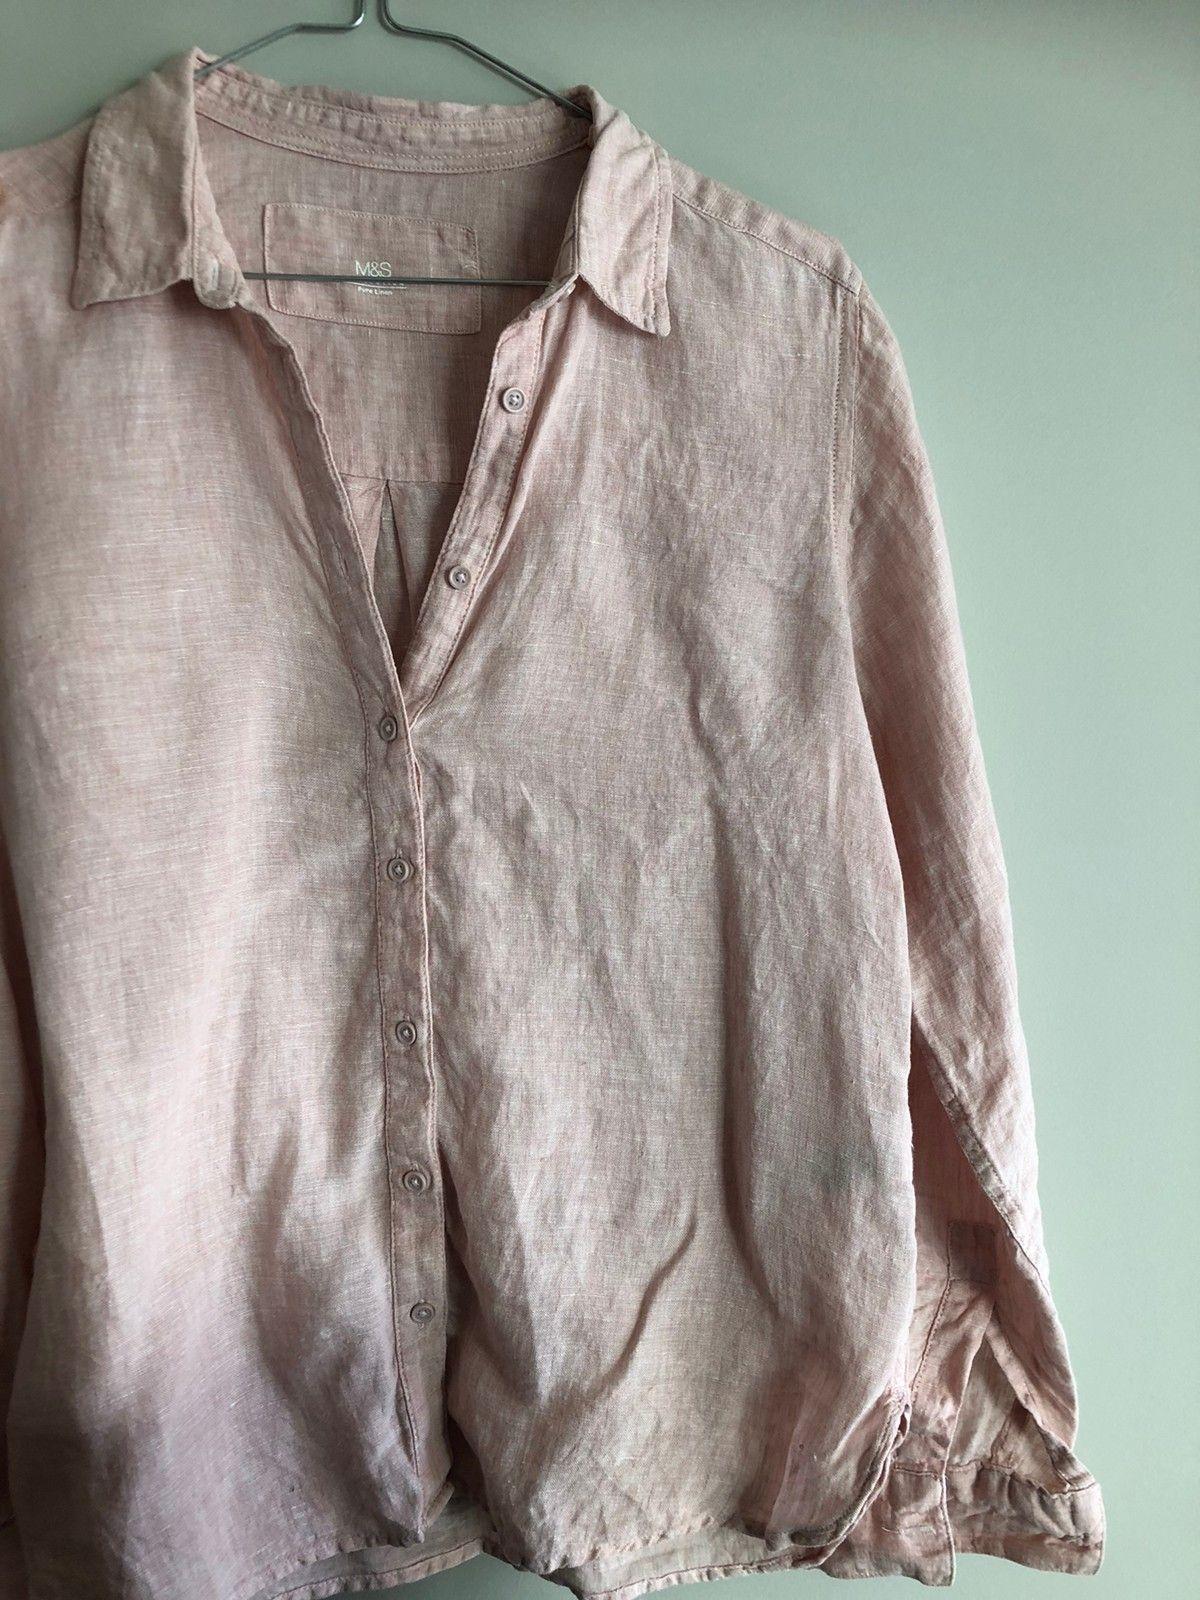 Lin skjorte til Sunnmørsbunad | FINN.no